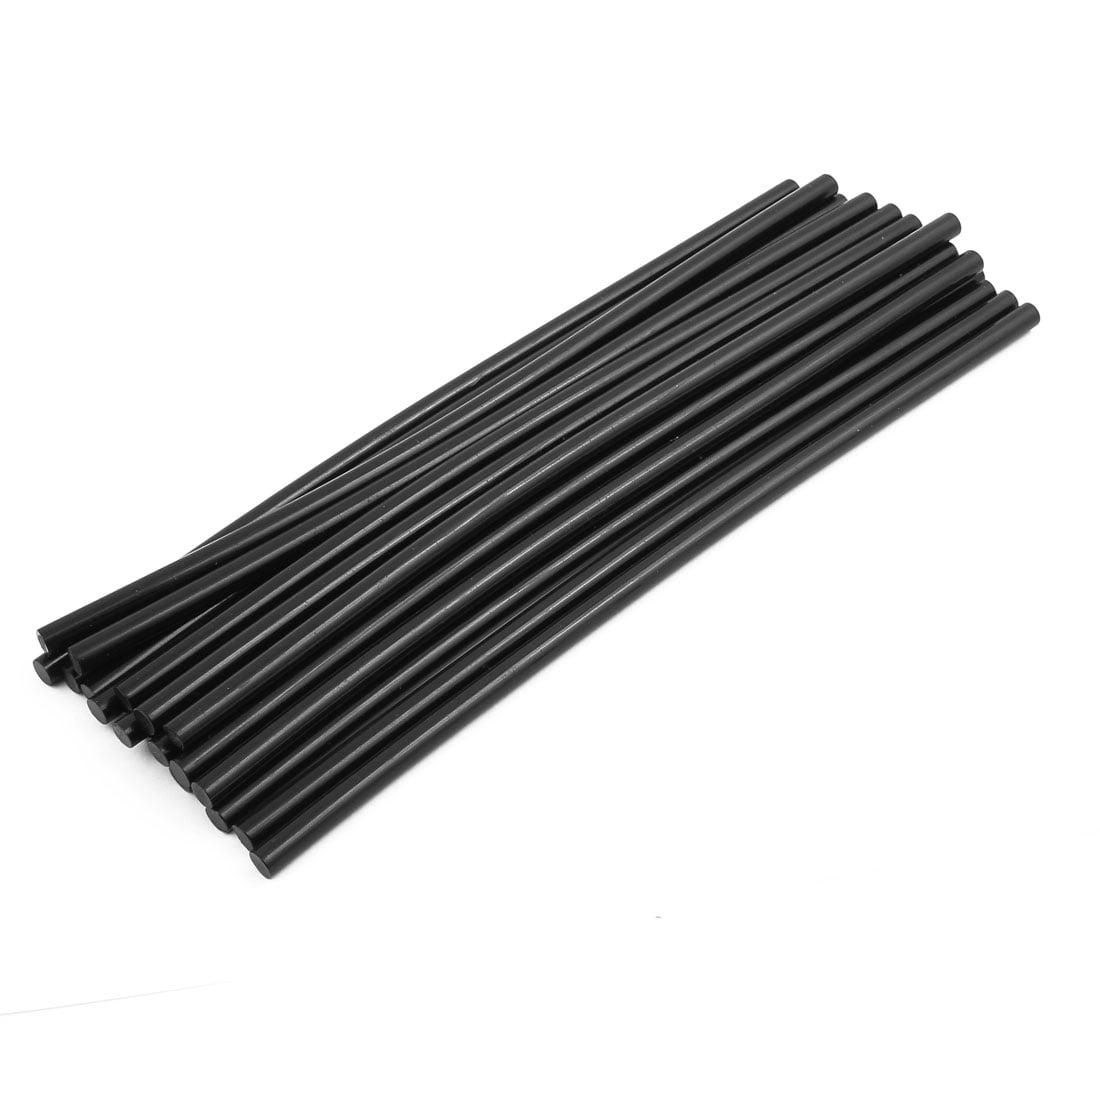 20Pcs 270mm x 7mm Hot Melt Glue Stick Black for Electric Tool Heating Glue Gun by